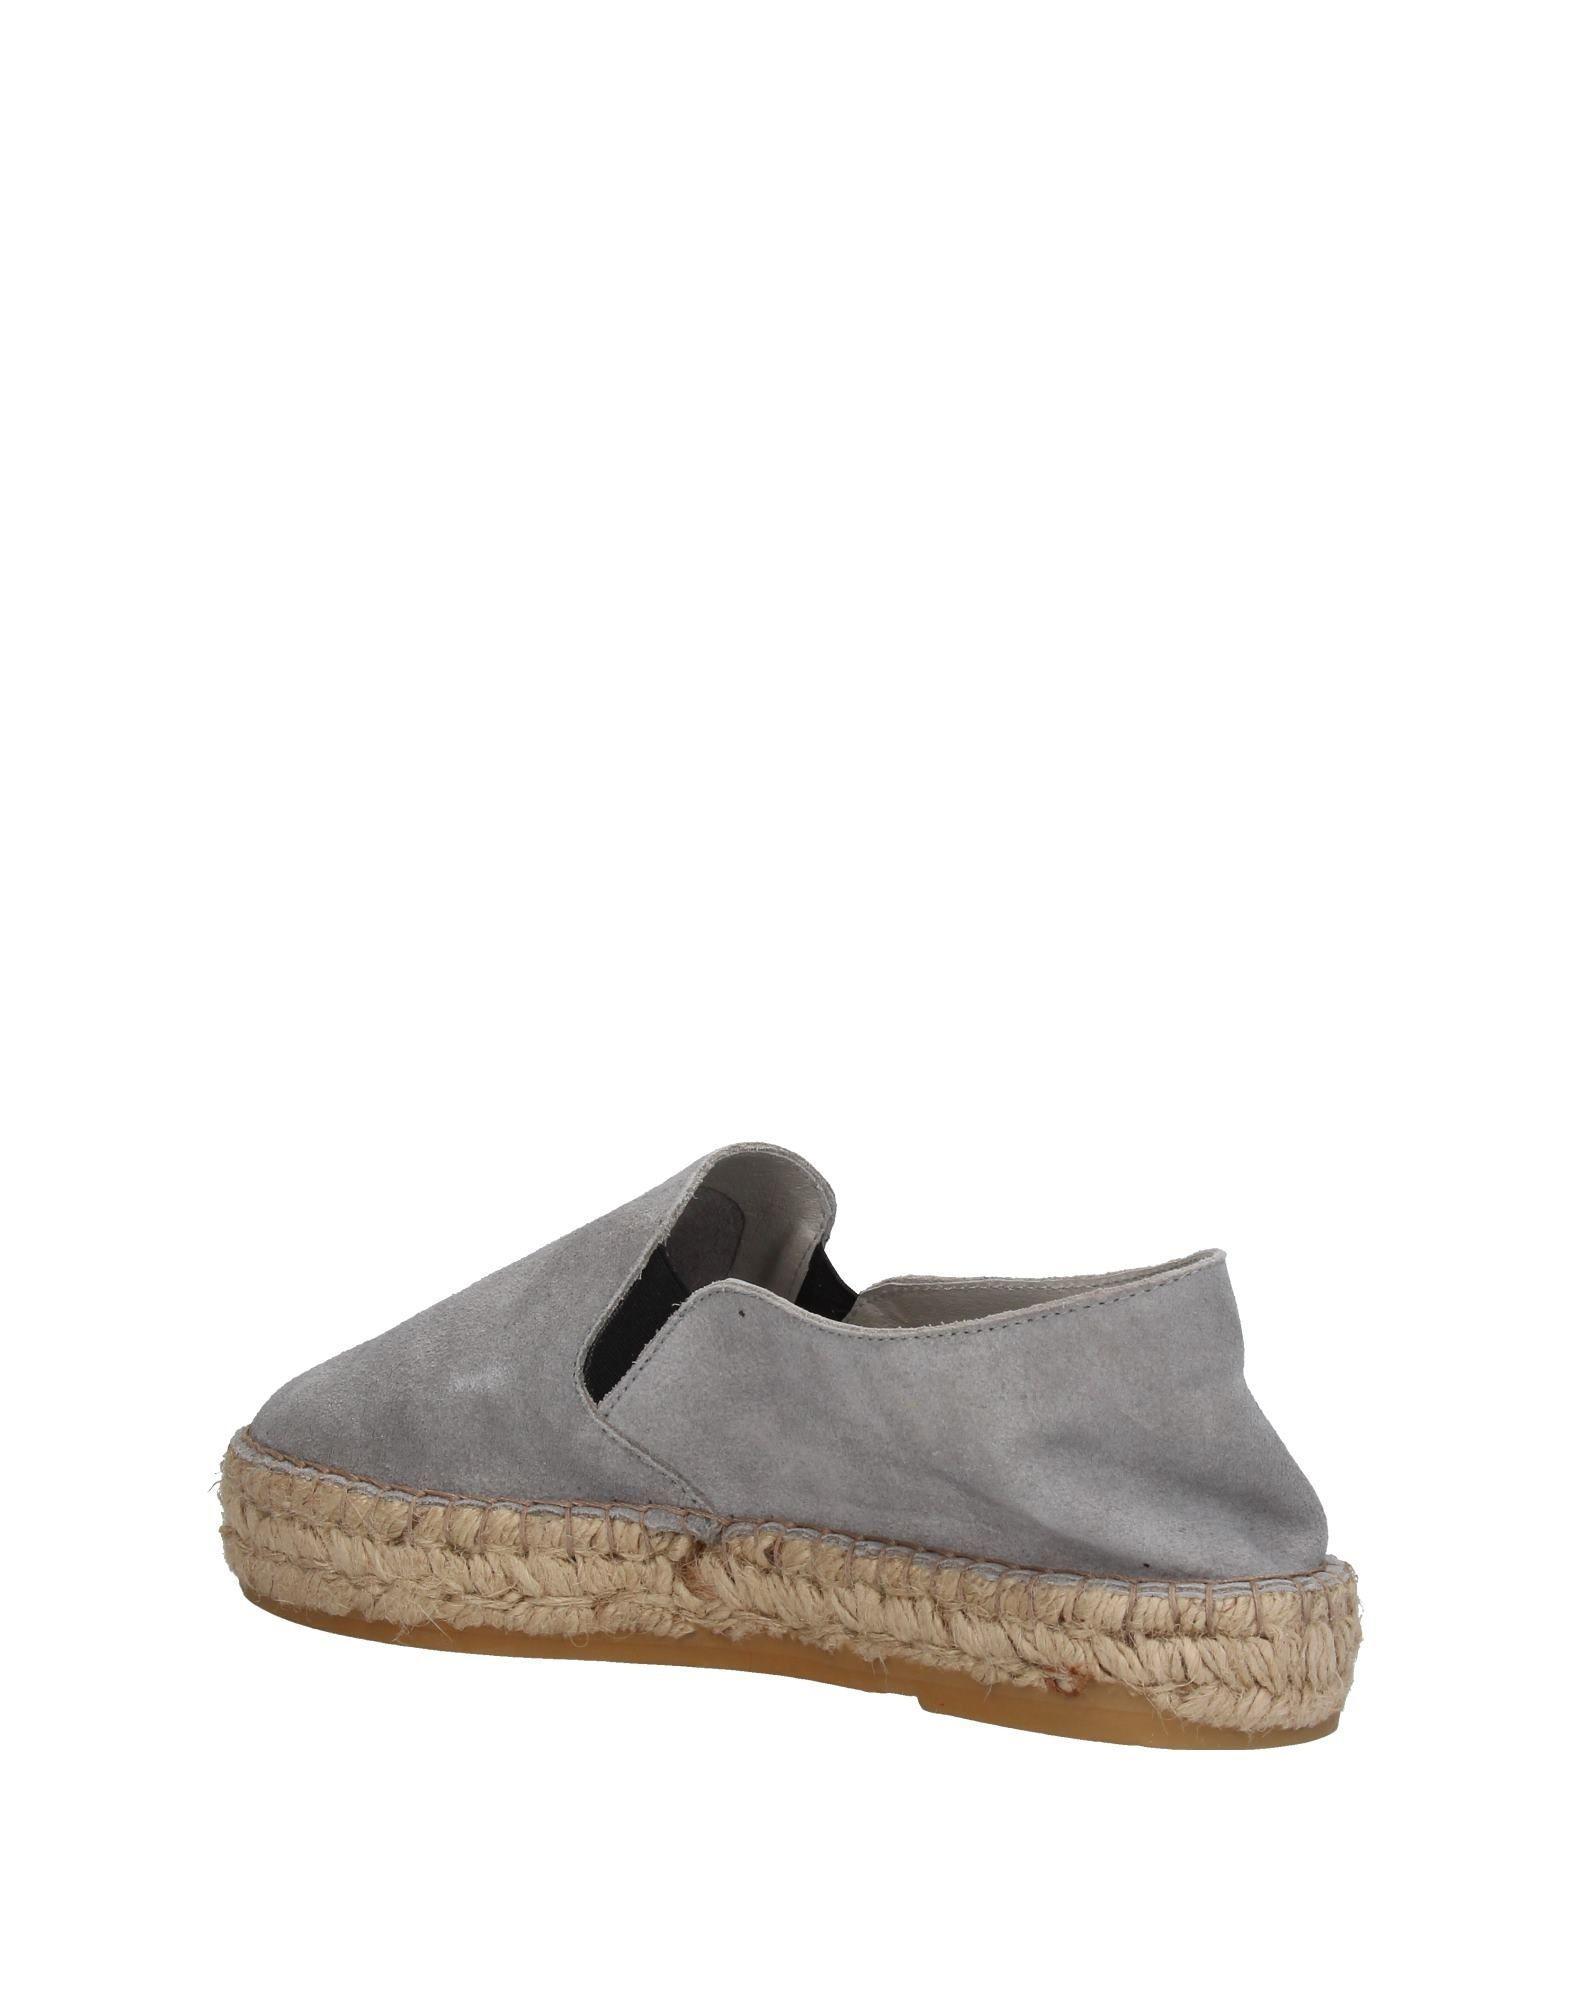 FOOTWEAR - Espadrilles Becks?ndergaard Cheap Sale Finishline duDL3g6IZ